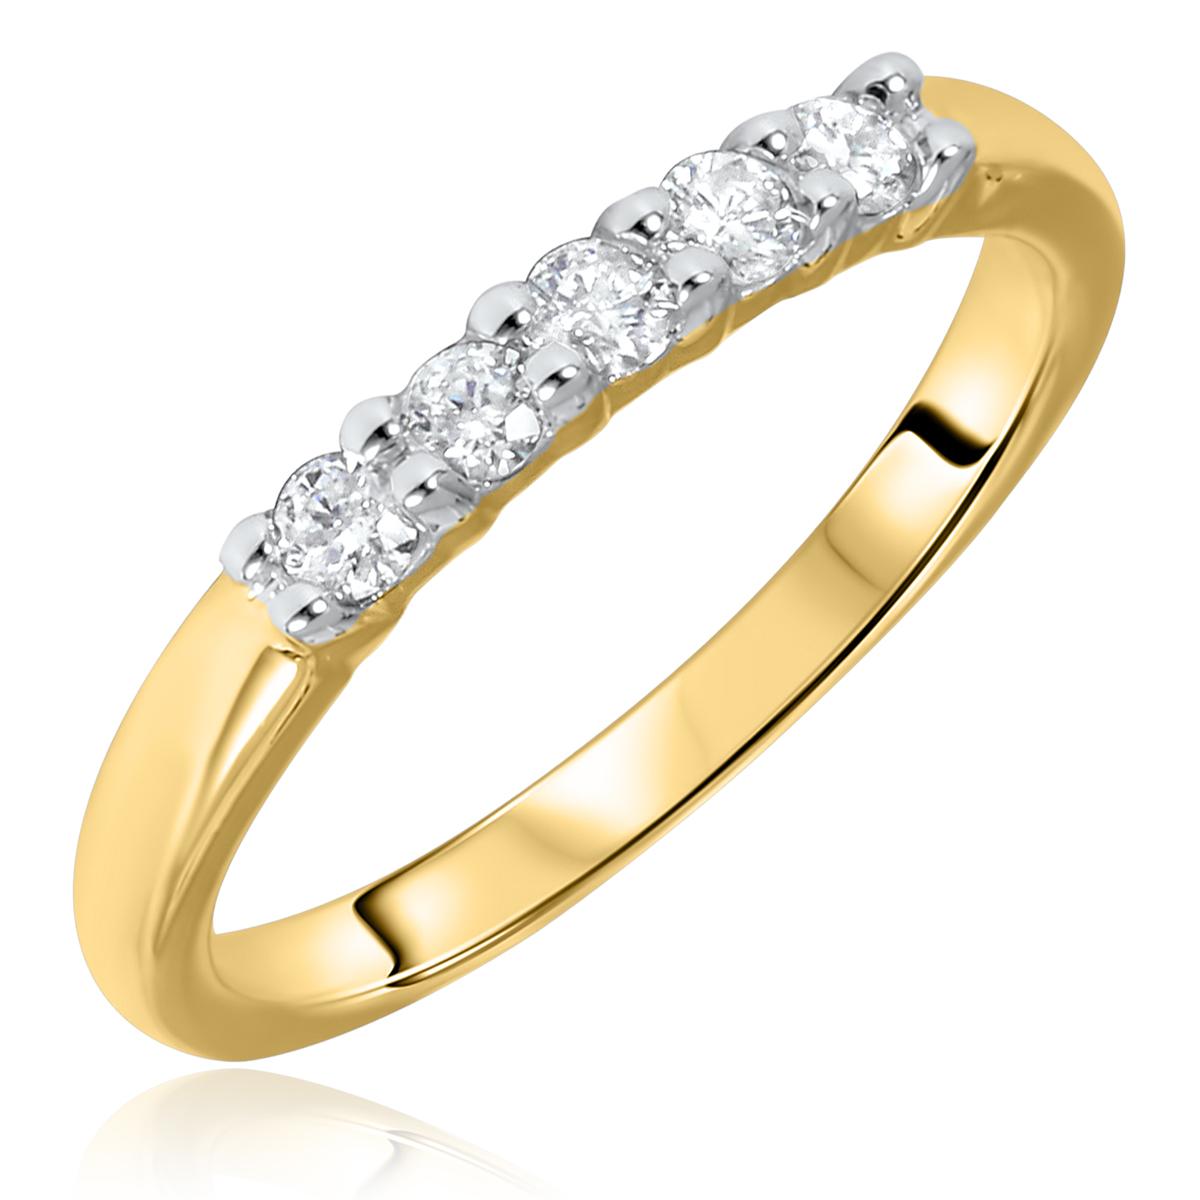 1/4 Carat T.W. Round Cut 5 Stone Diamond Anniversary Ladies Band 14K Yellow